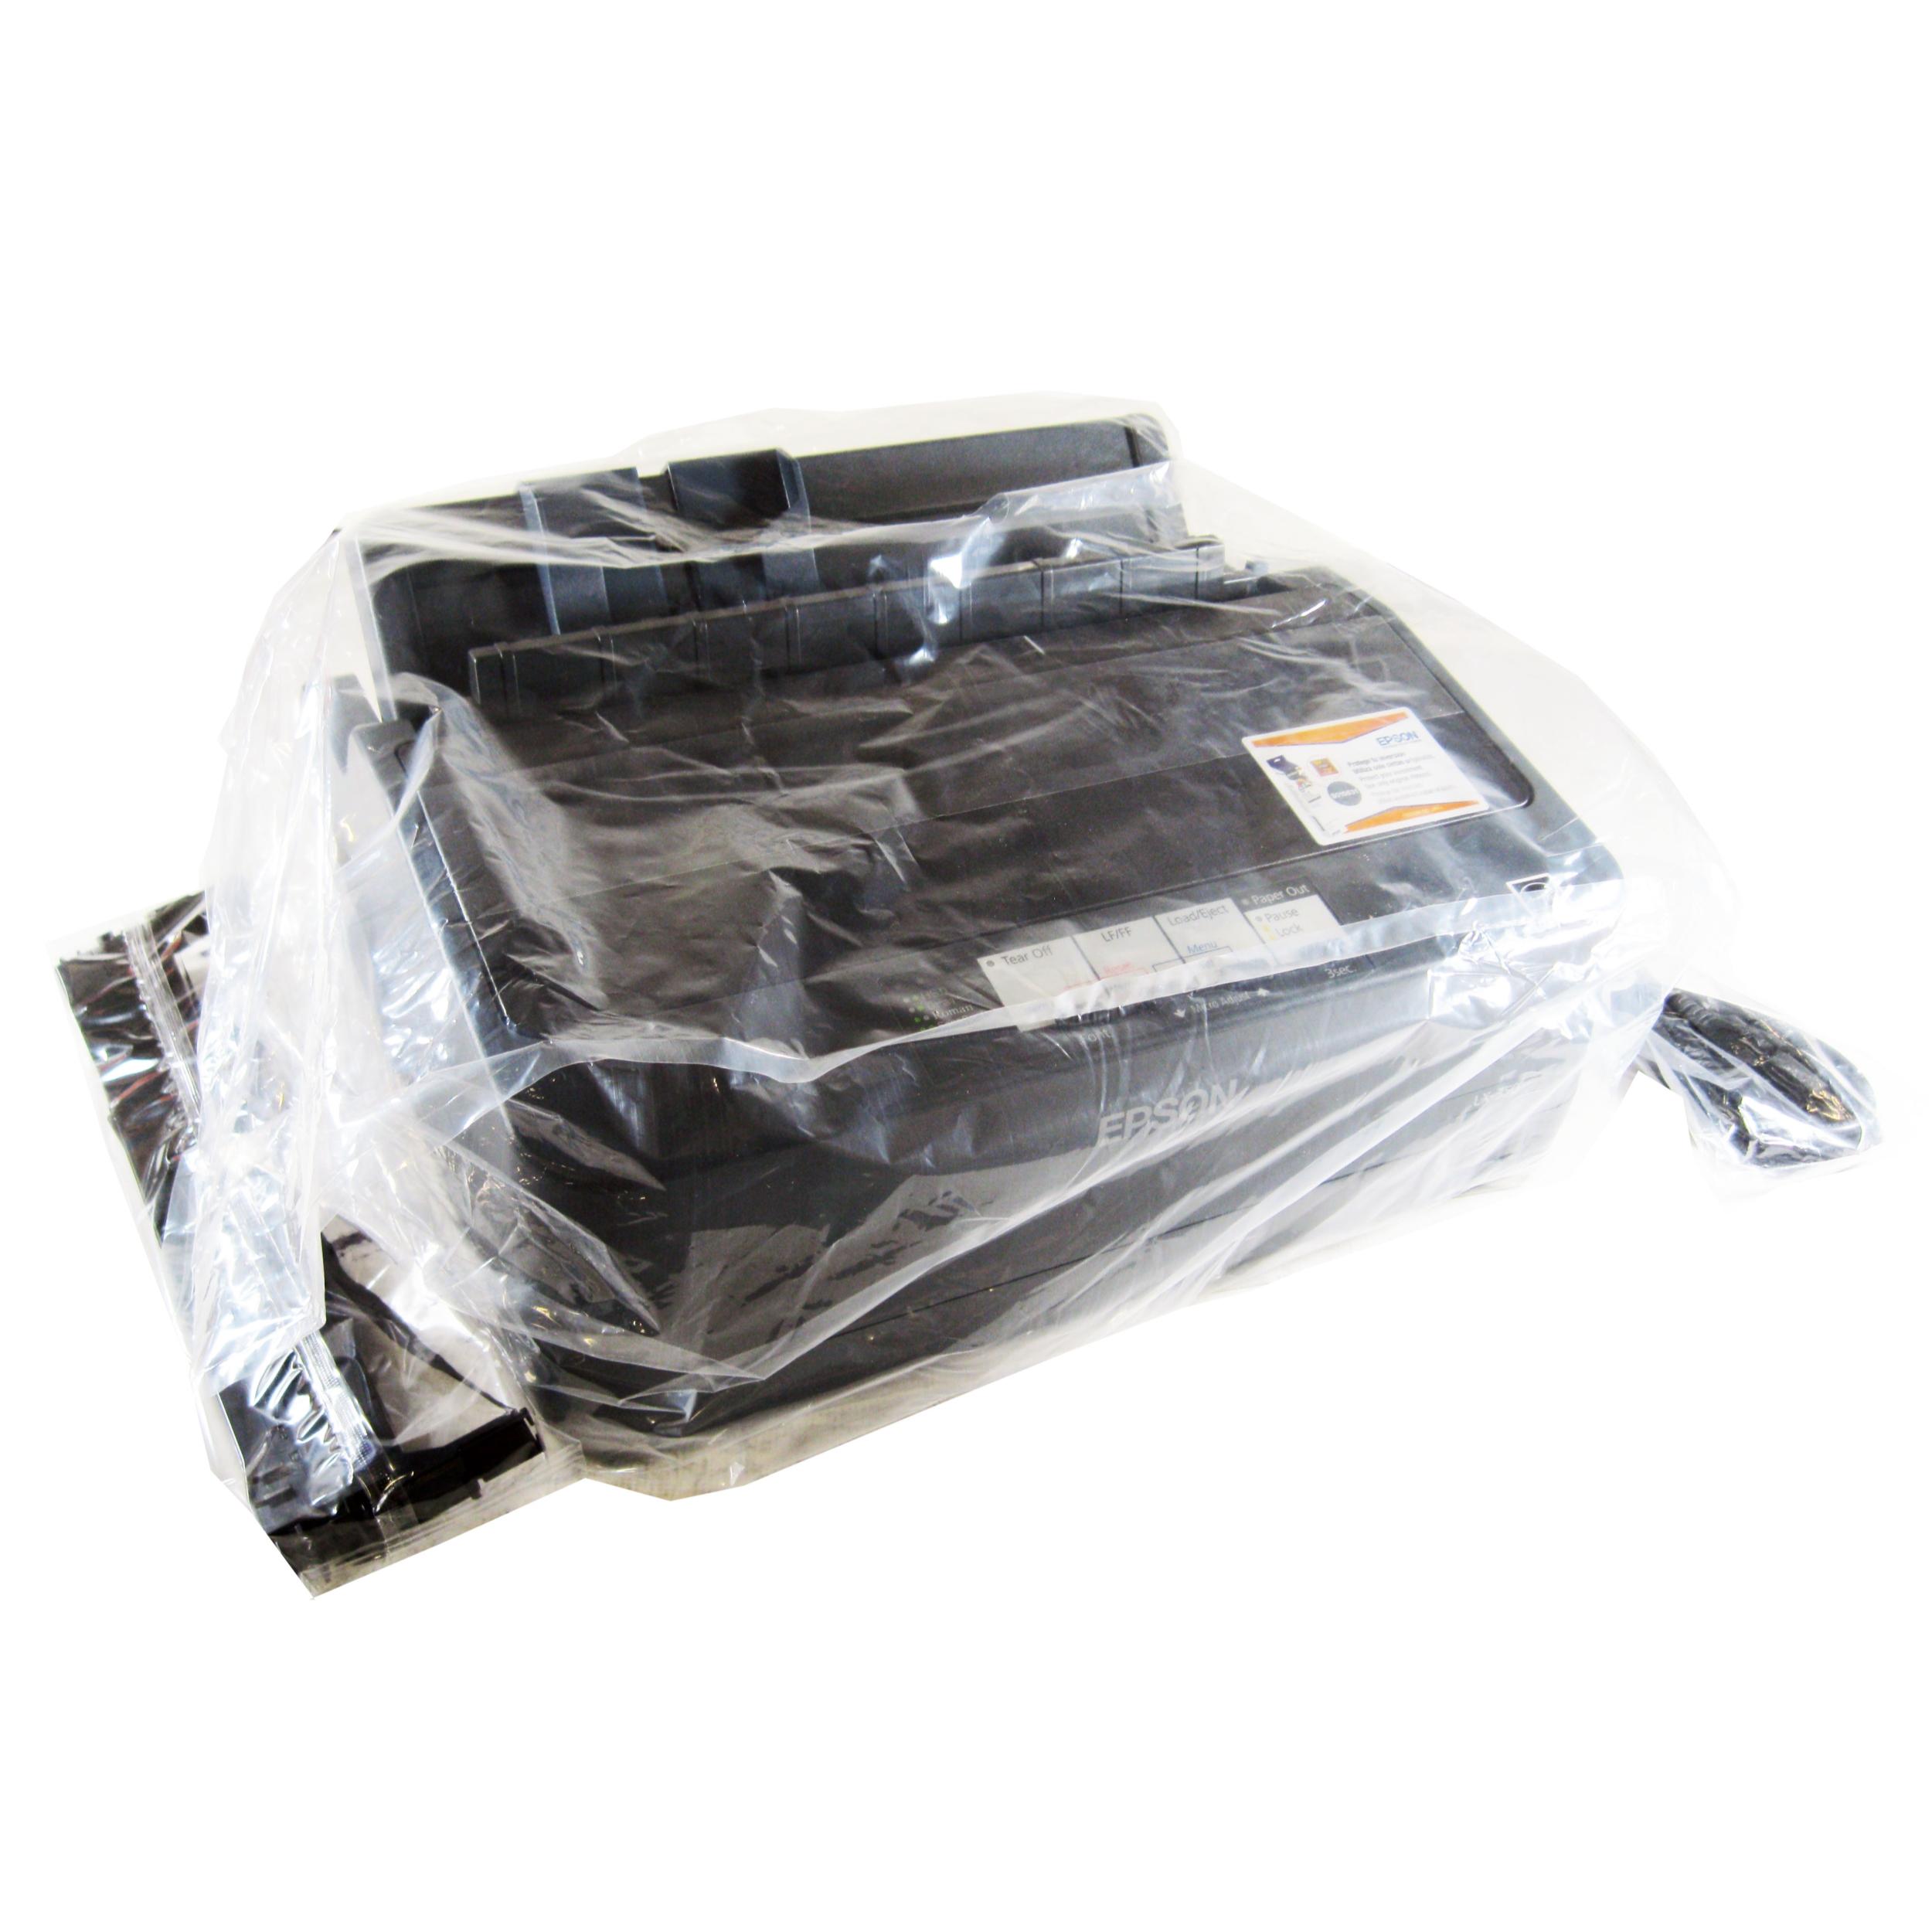 Epson LX-350 C11CC24001 9 Pin 128KB RAM 120V Narrow Carriage Impact Printer